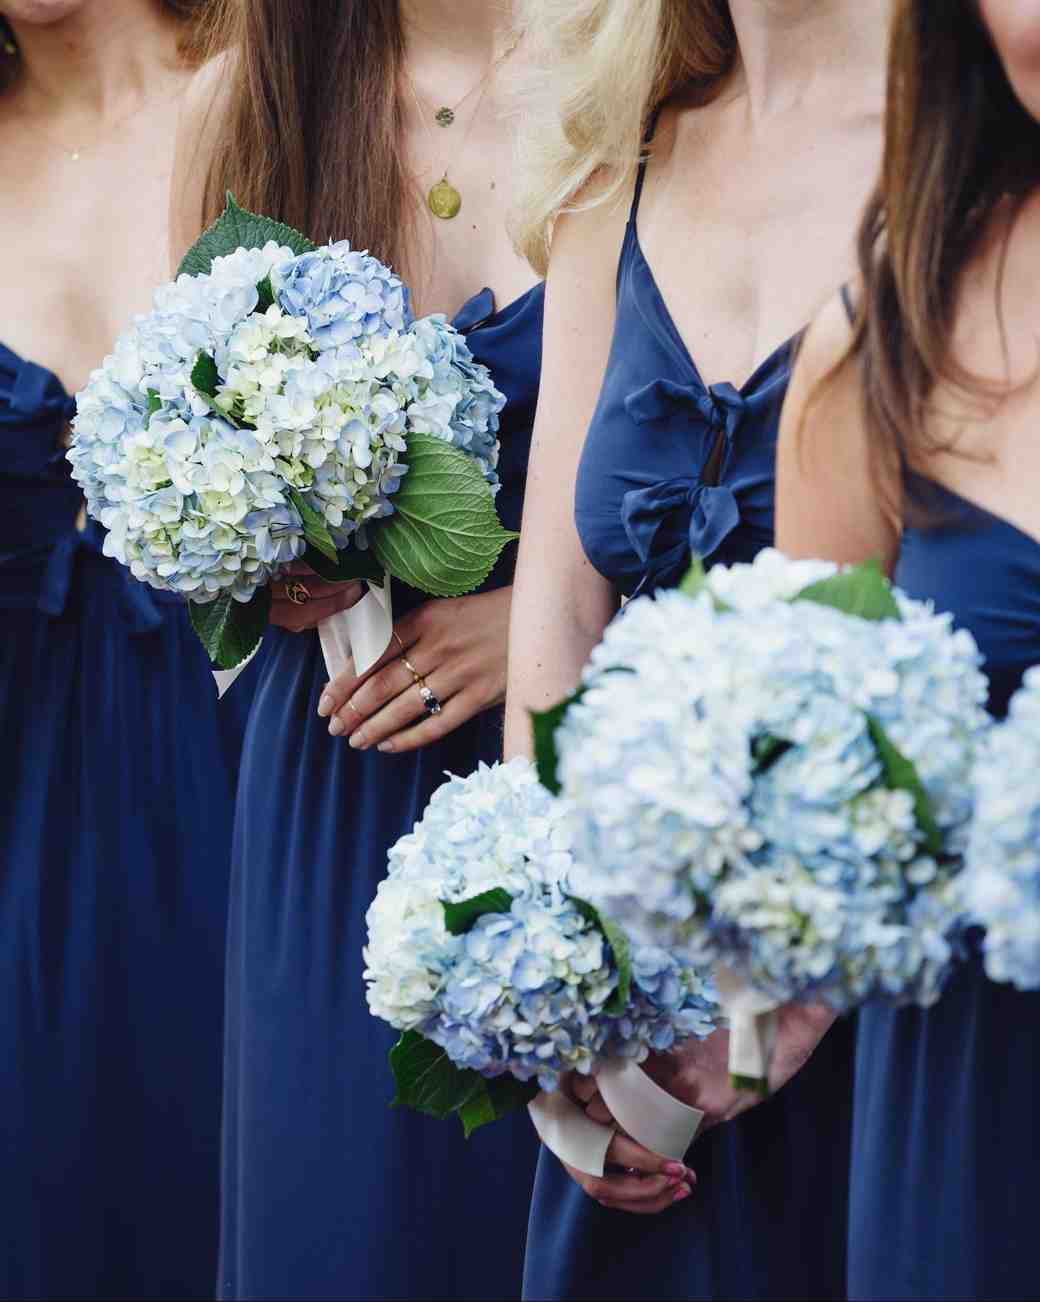 Flowers Needed For Wedding Checklist | Kayaflower co